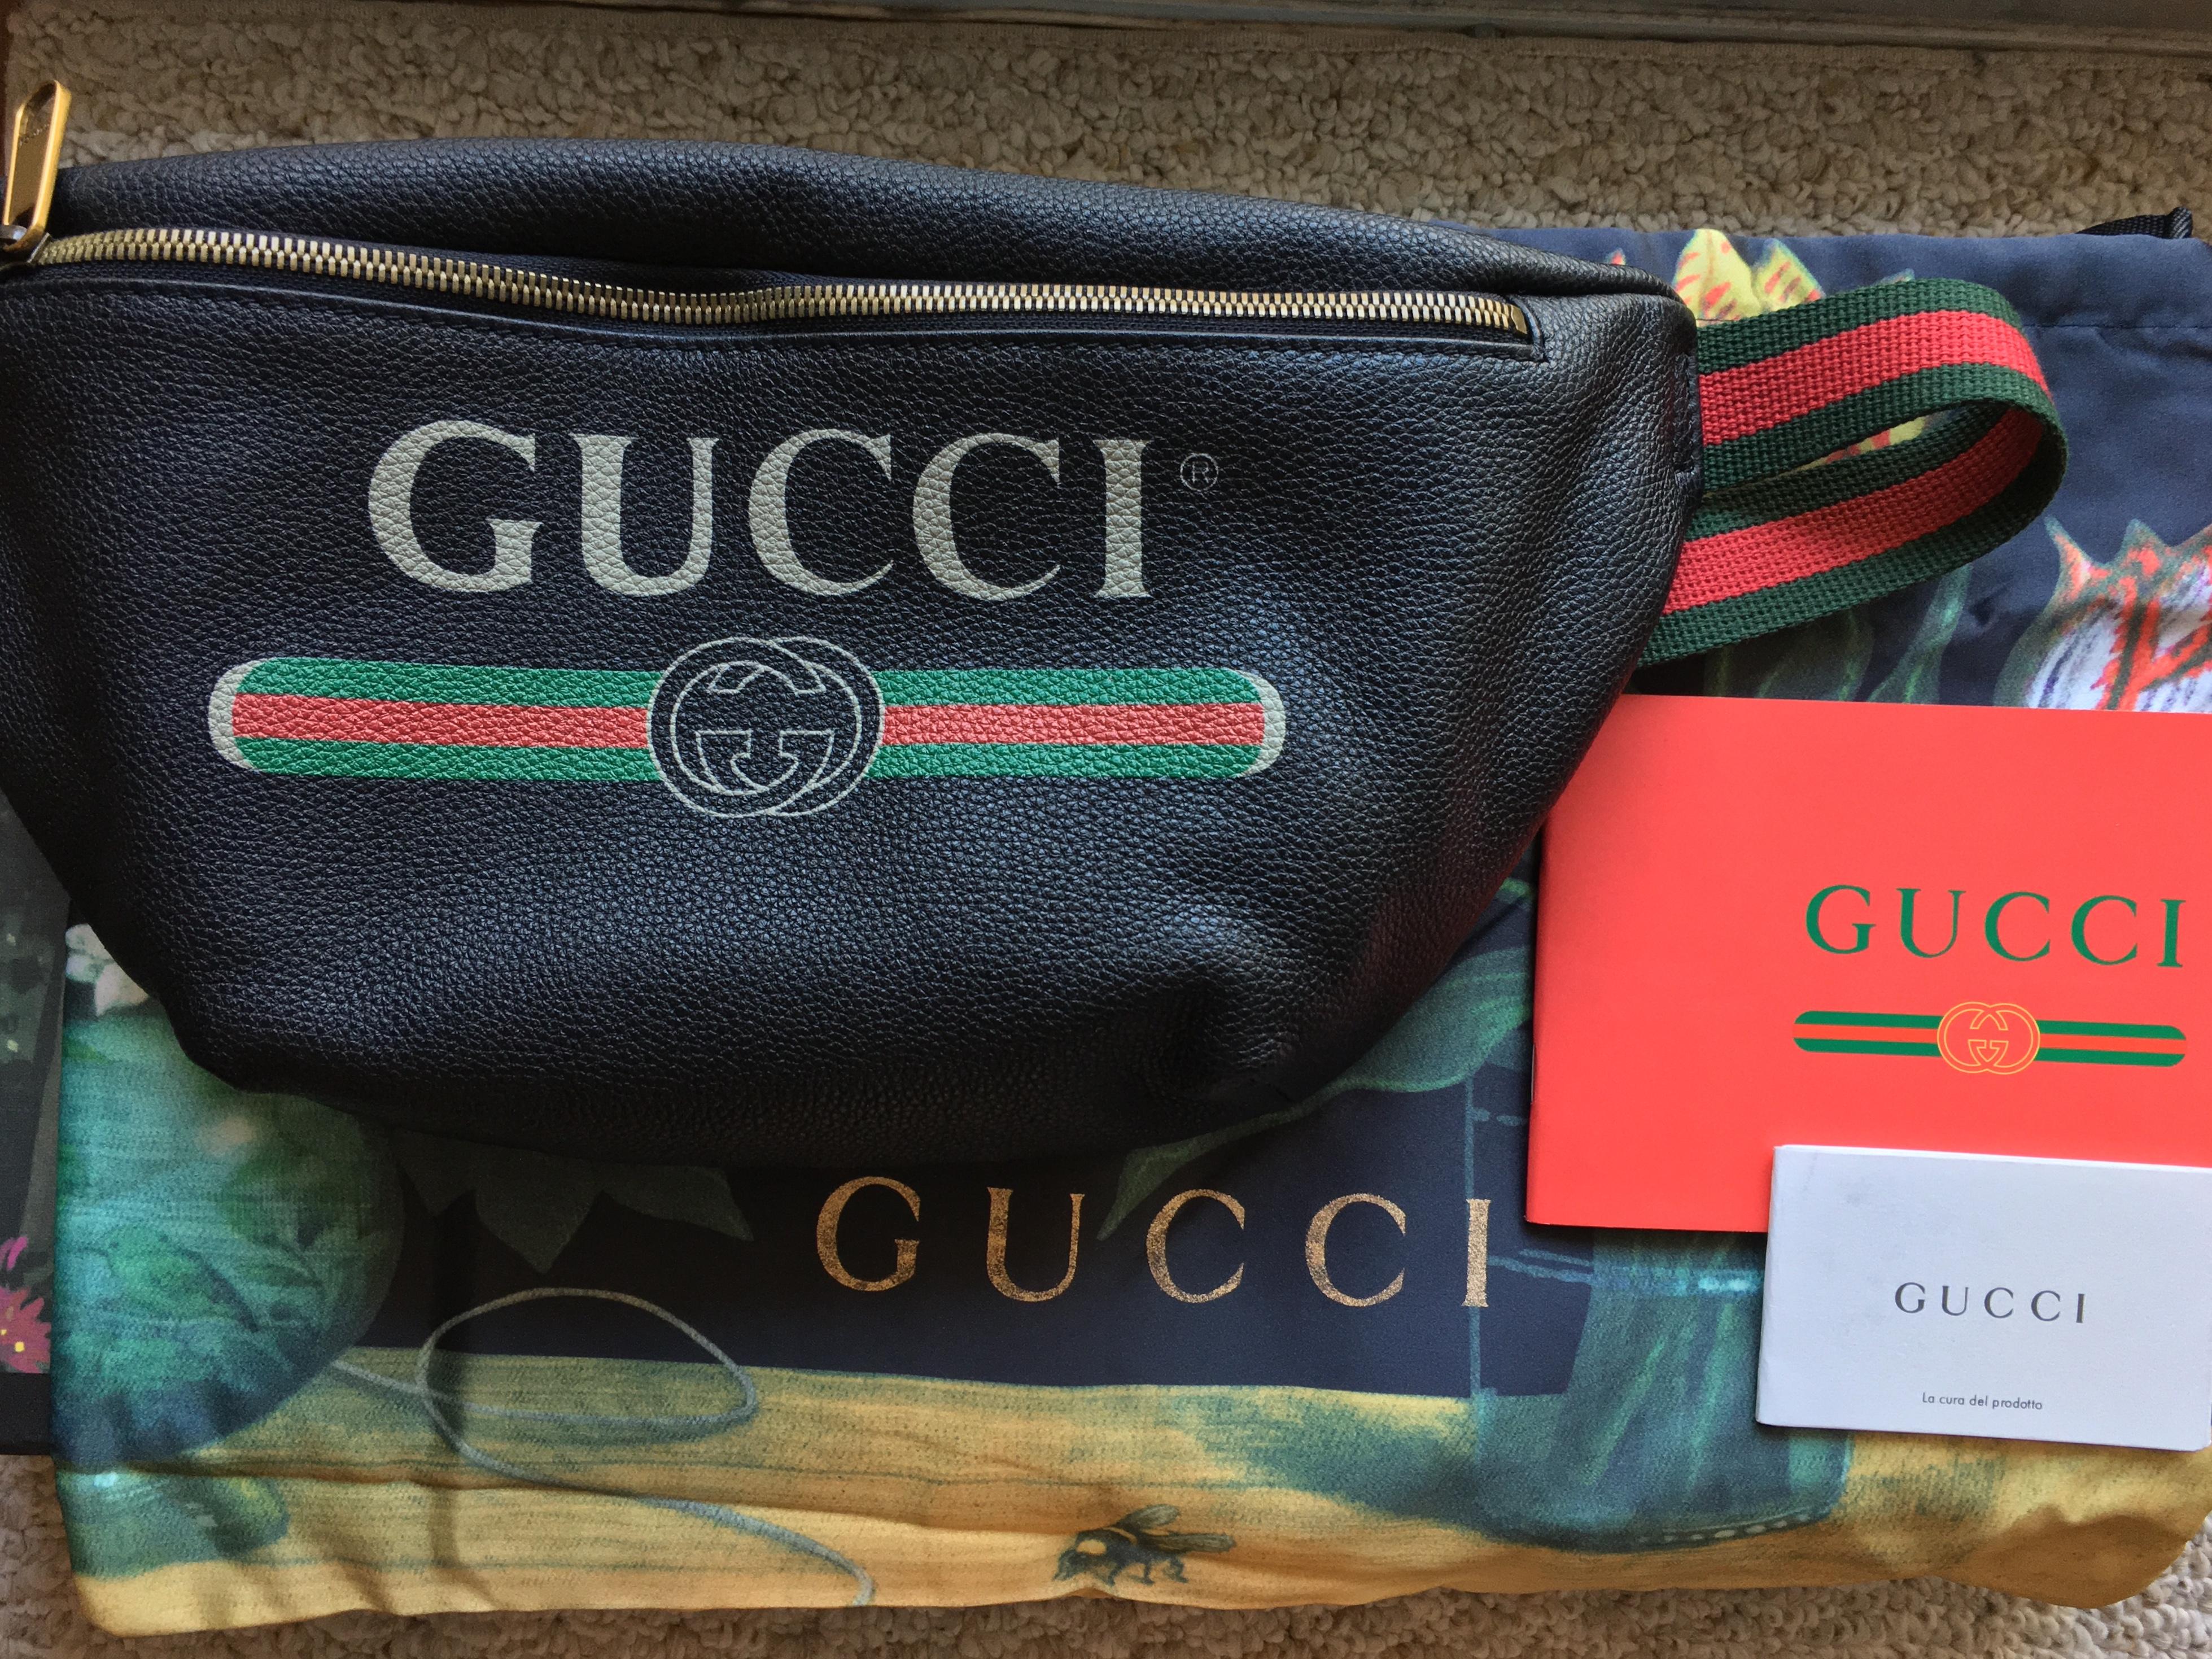 d7c50228b49 Gucci Gucci Print Leather Belt Bag   Size Gucci 90